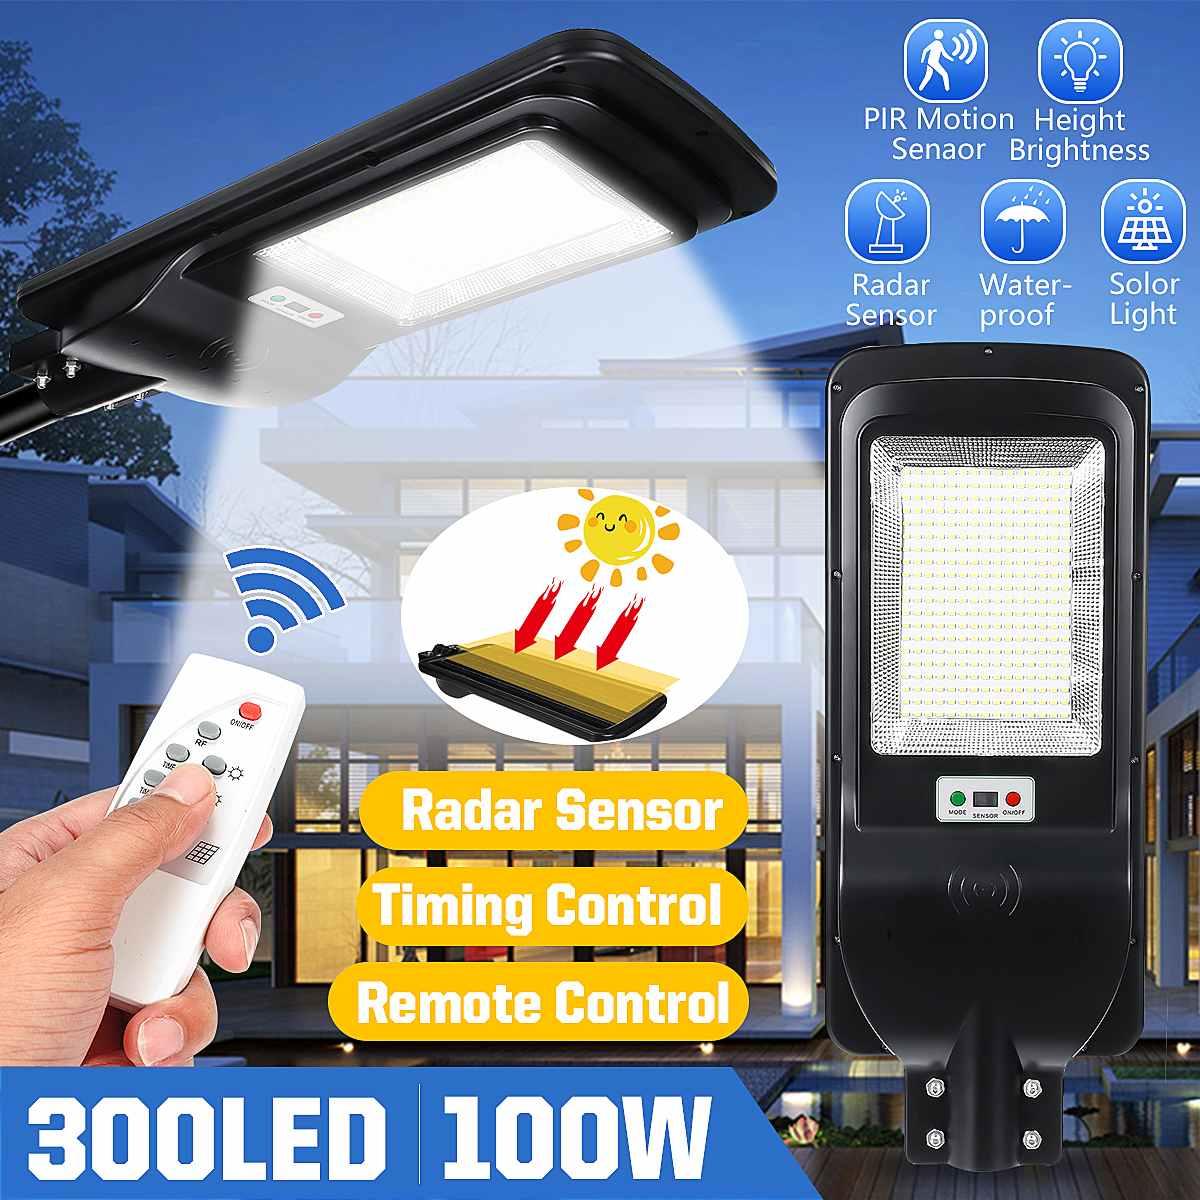 300LED الشمسية ضوء الشارع مقاوم للماء IP65 PIR محس حركة الذكية التحكم عن بعد مصباح 100 واط في الهواء الطلق حديقة الأمن الجدار الخفيفة